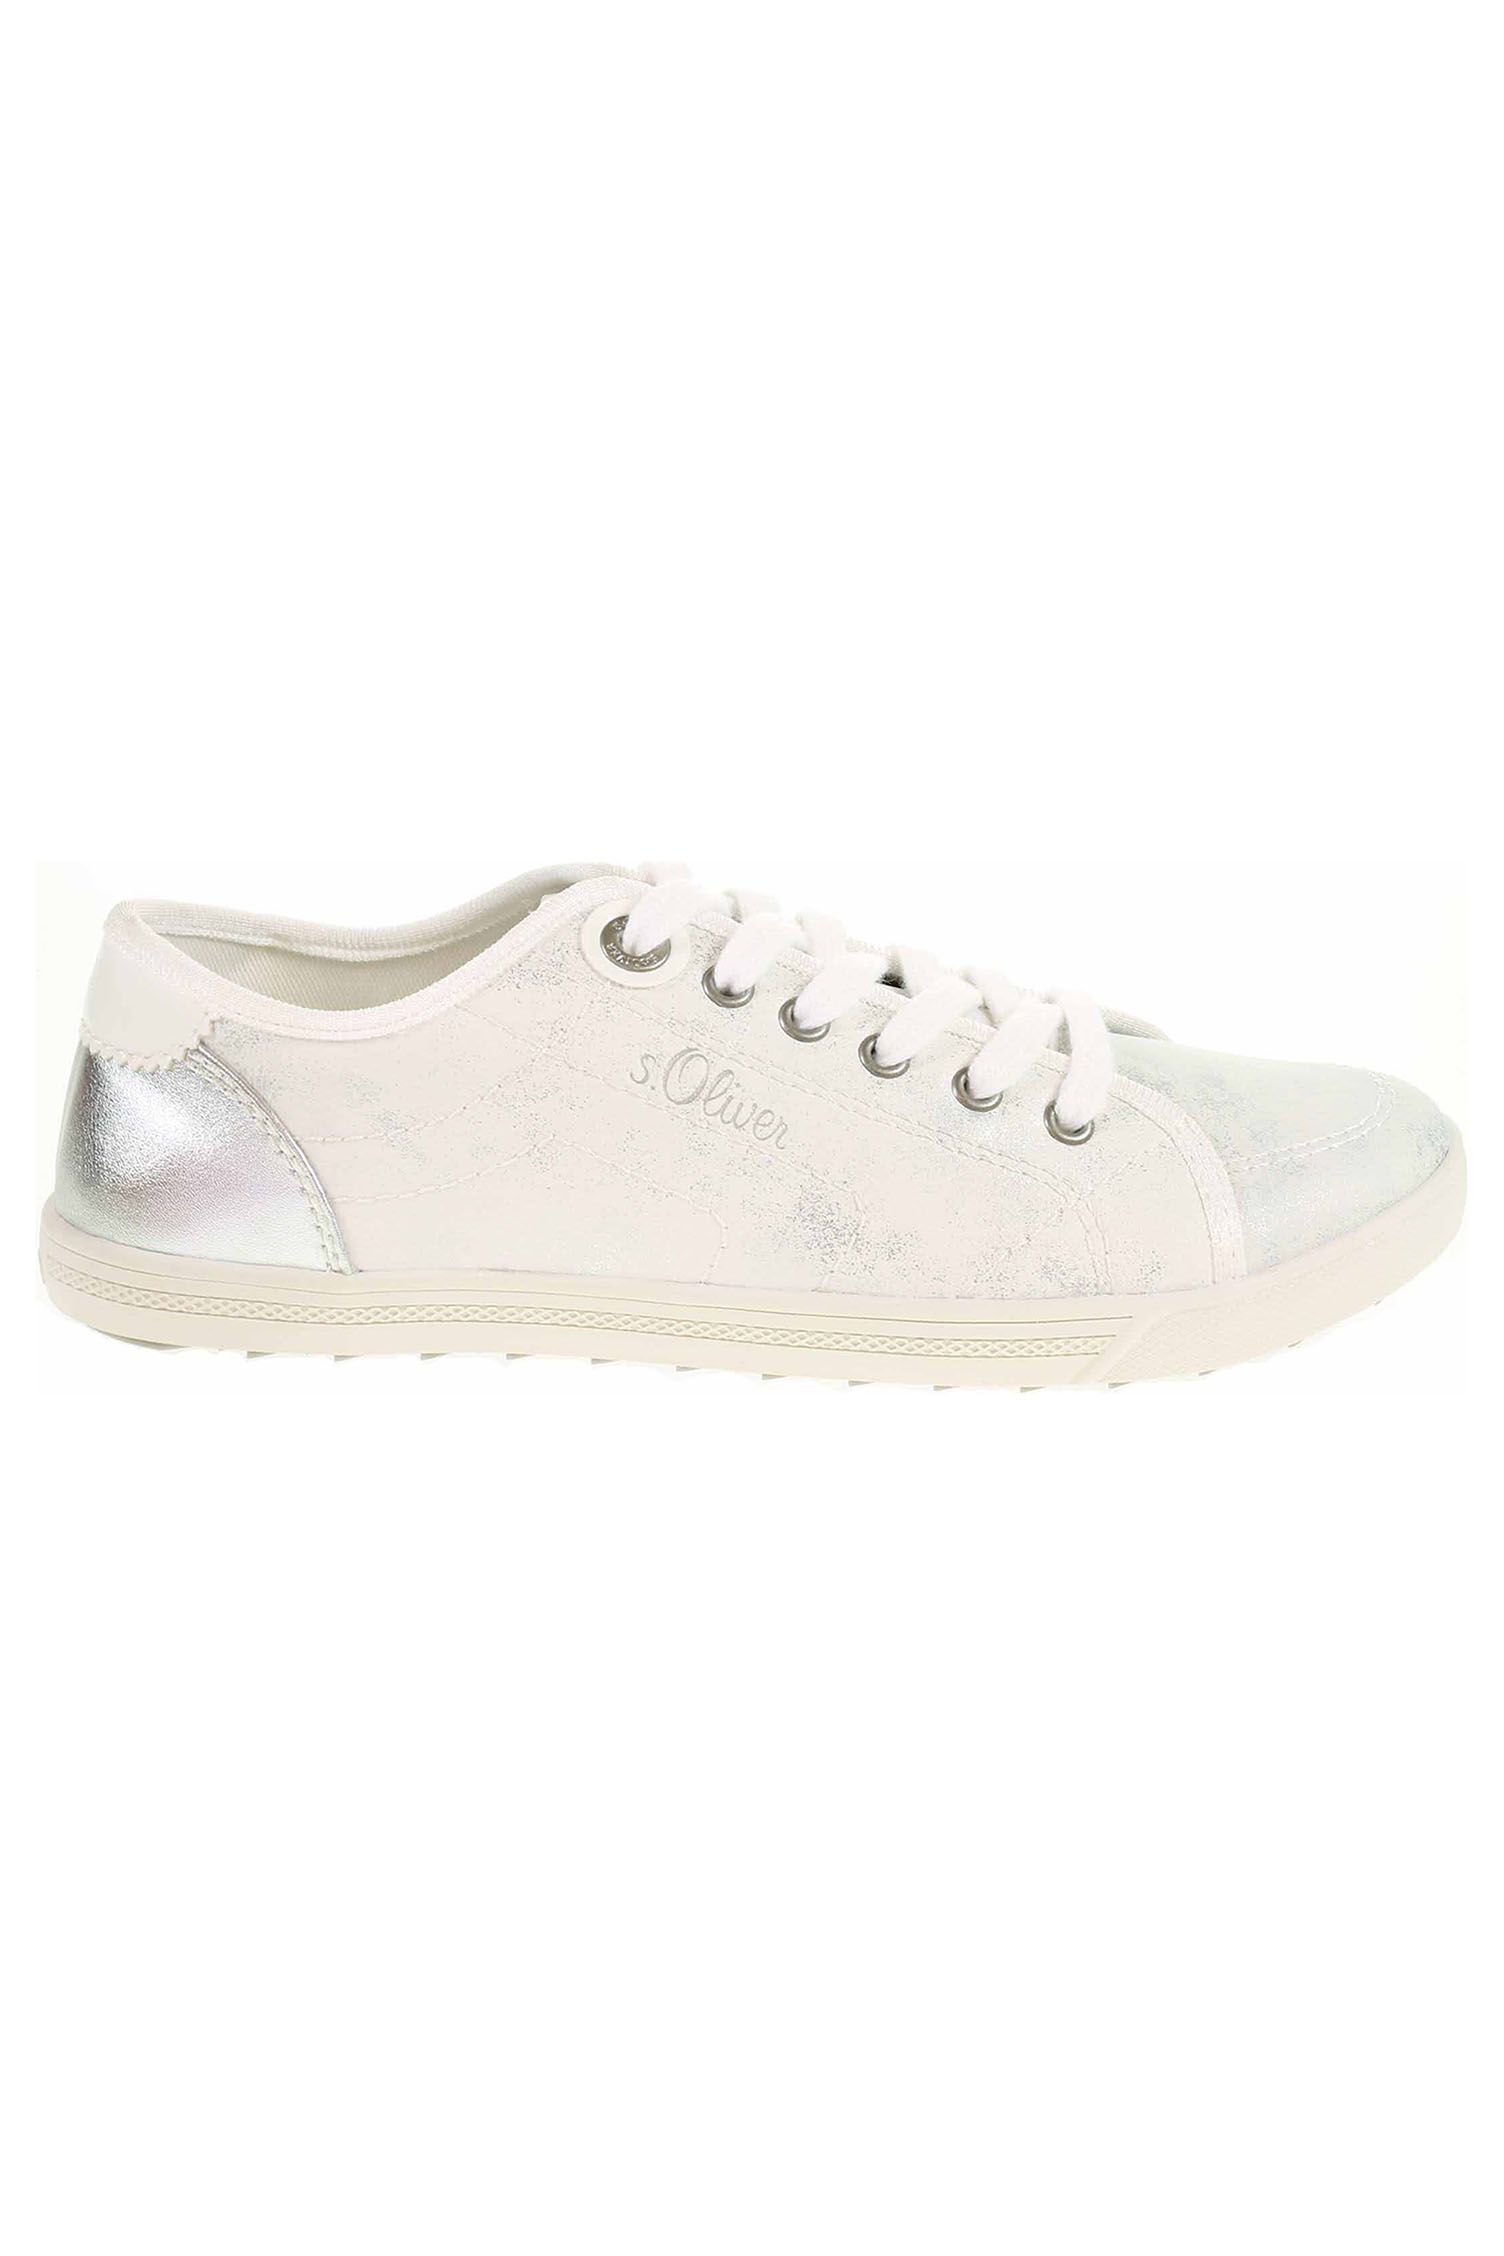 s.Oliver dámská obuv 5-23631-22 white-silver 5-5-23631-22 193 - Glami.sk 0aaa86133bb